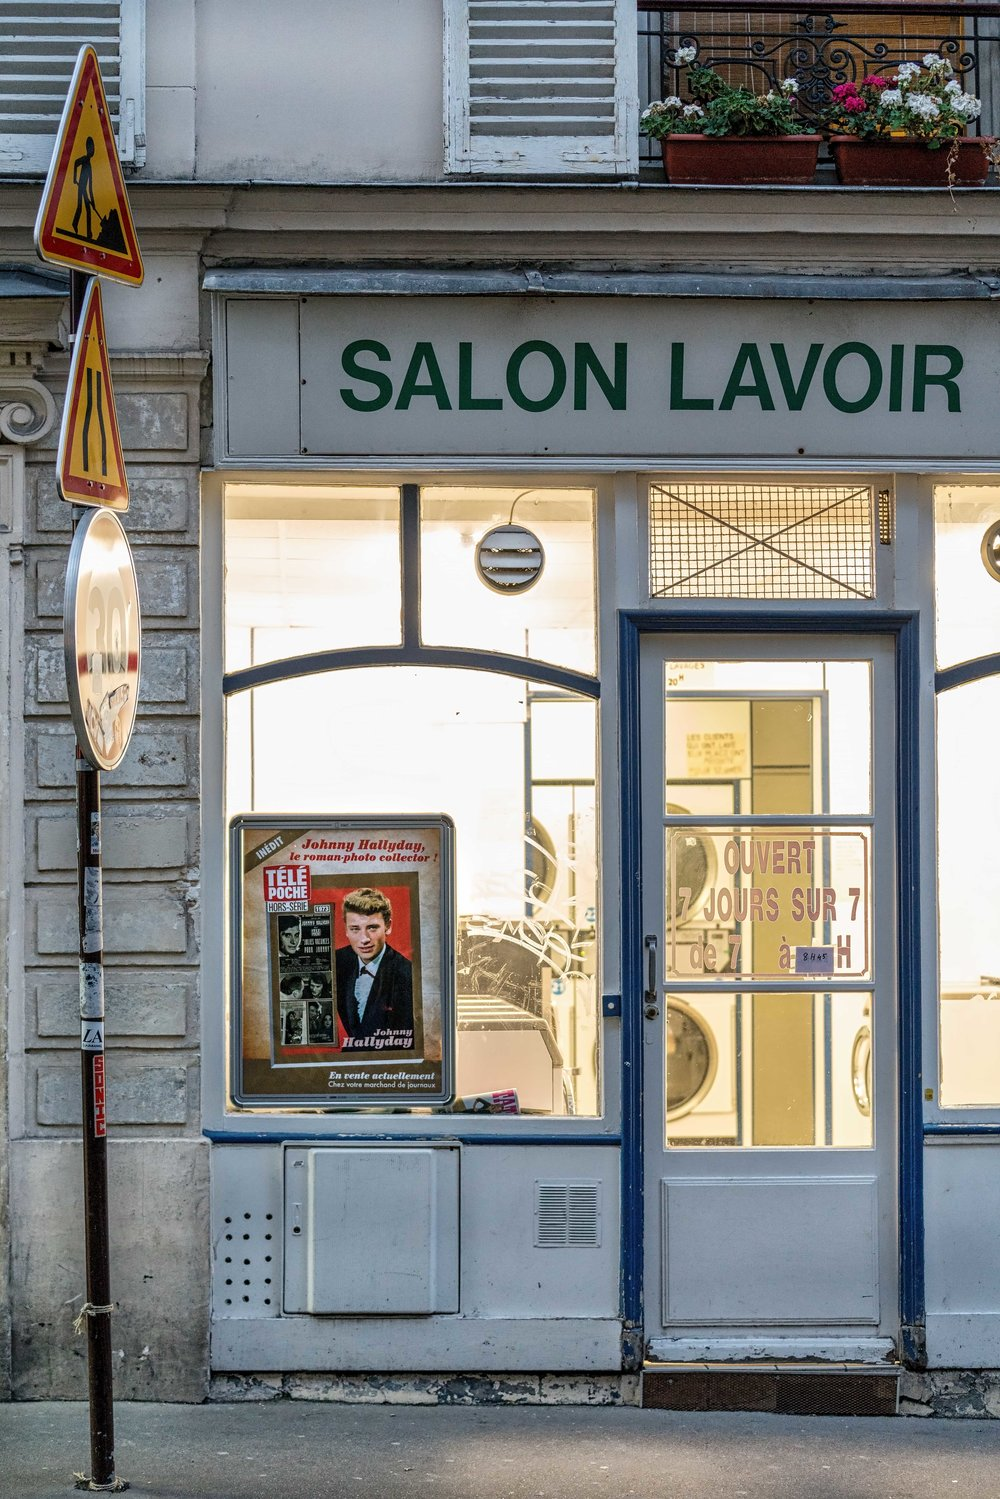 _DSC1293_Copyright_sRGB_Relative_Salon Lavoir.jpg